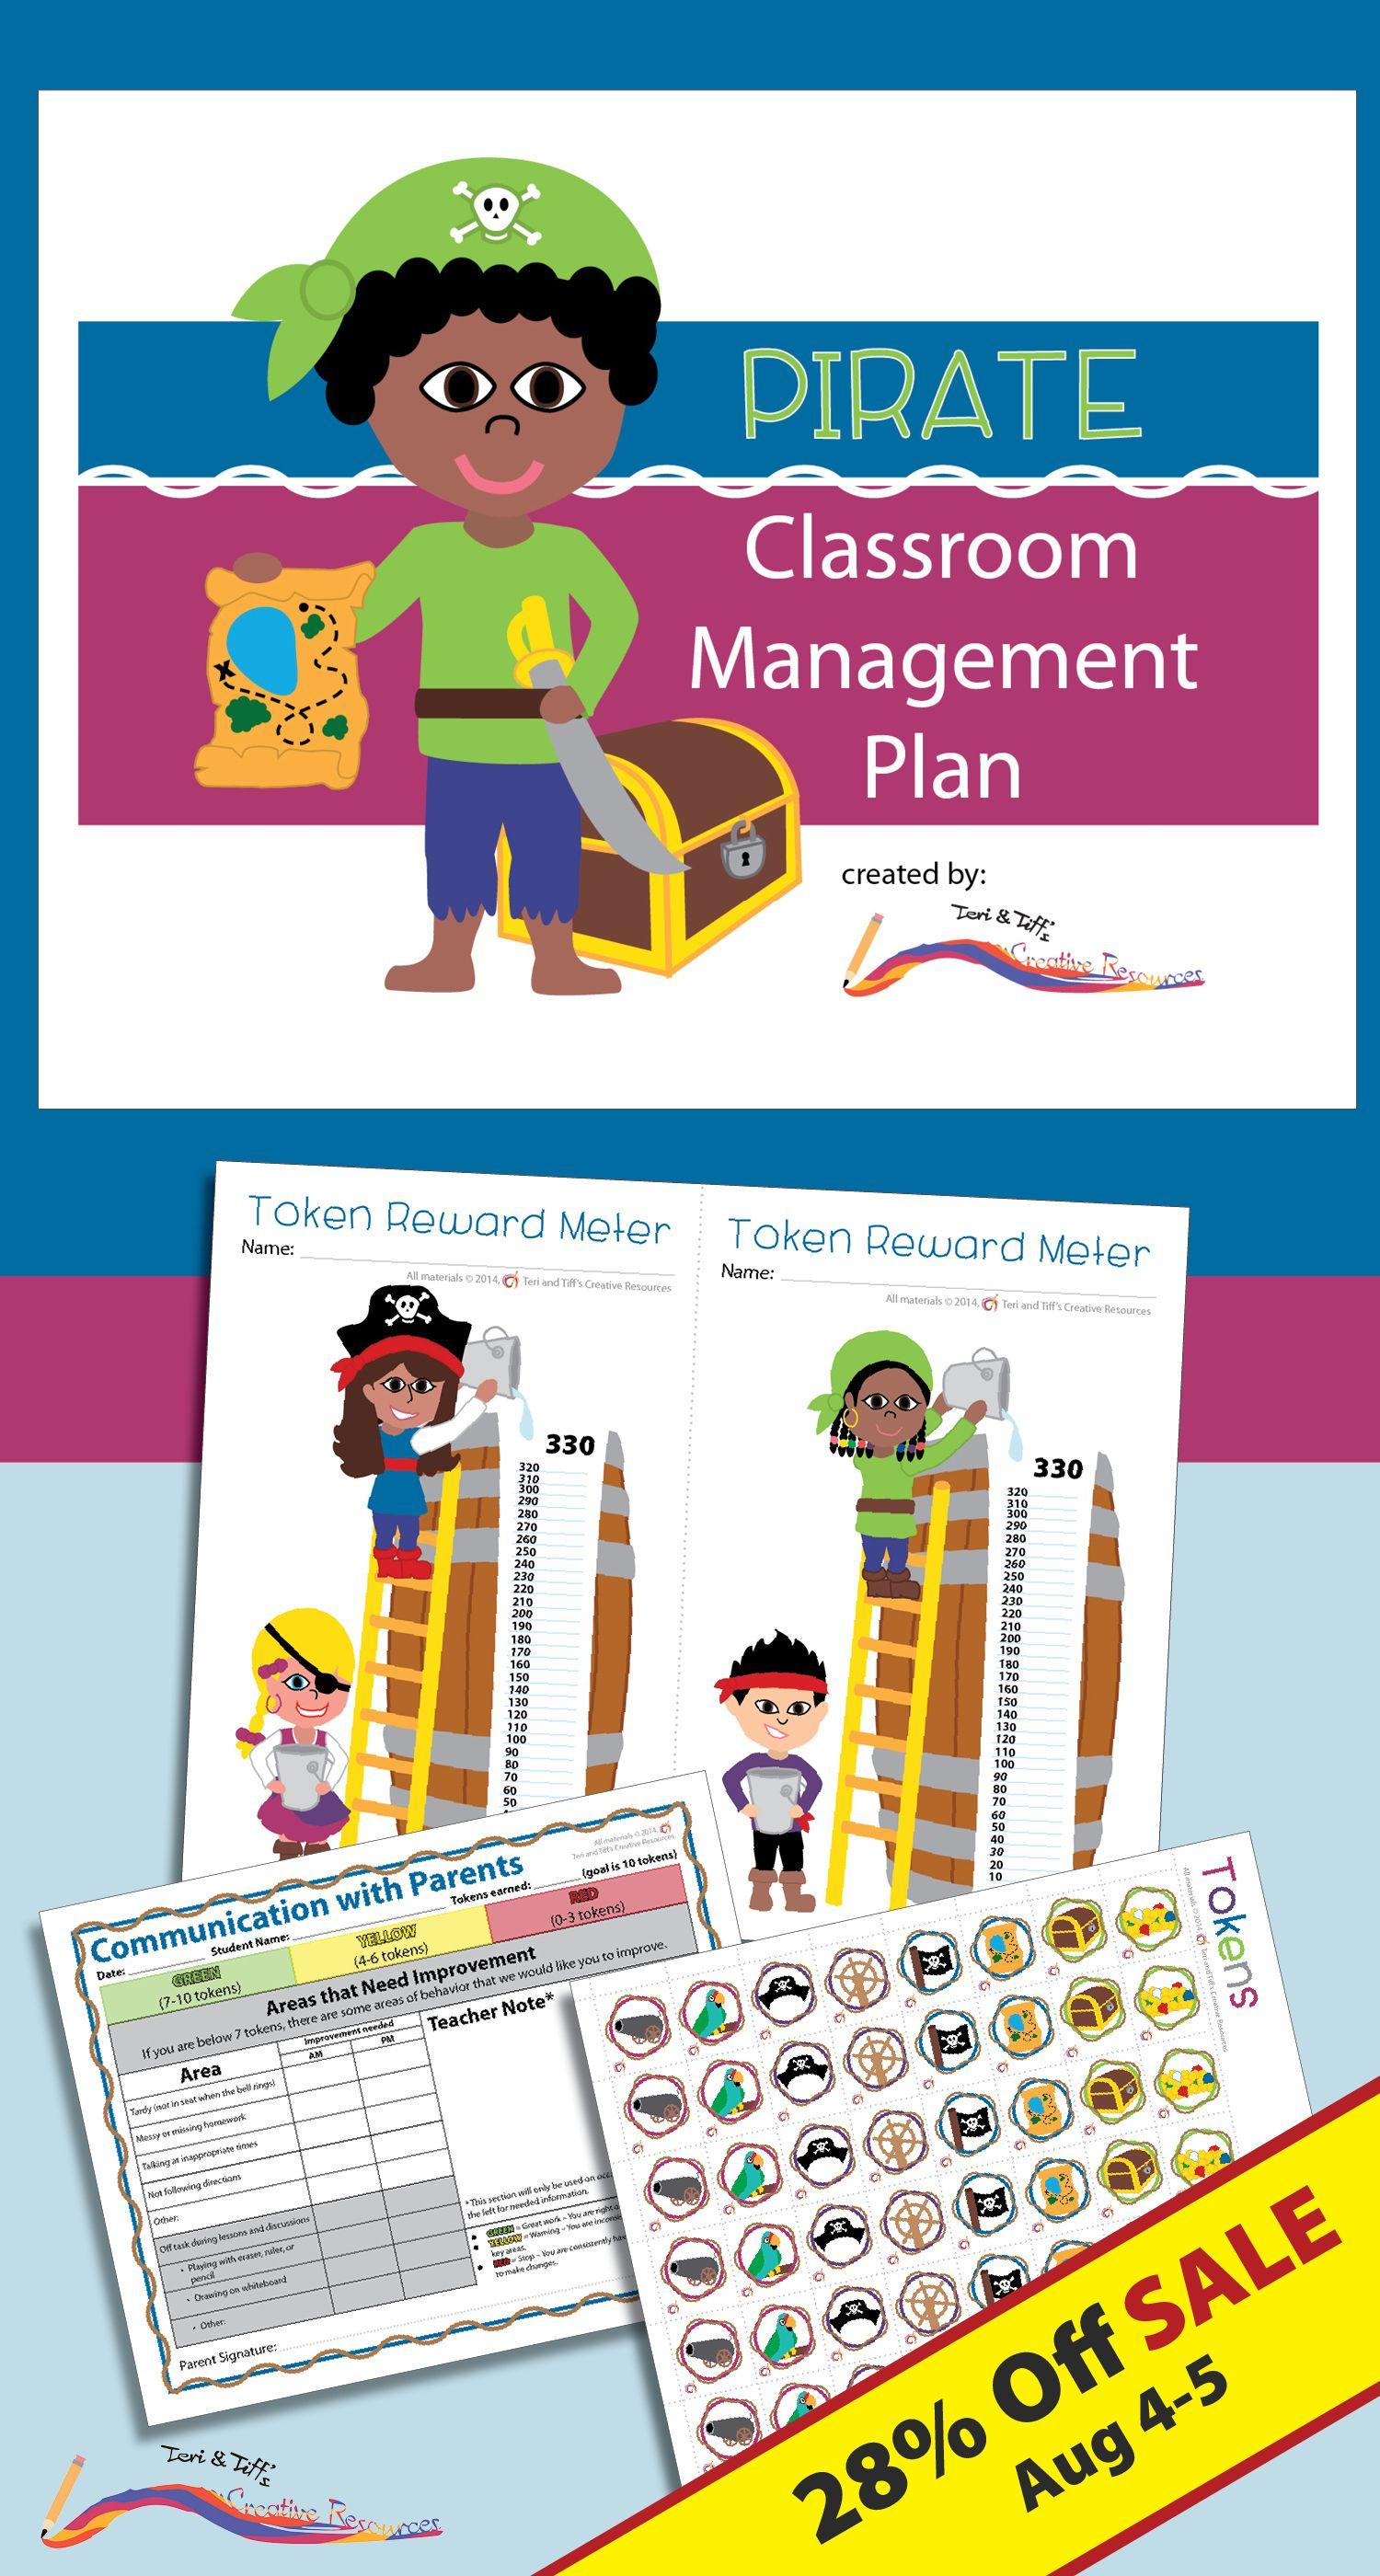 Classroom Management Plan Pirate Style Classroom Management